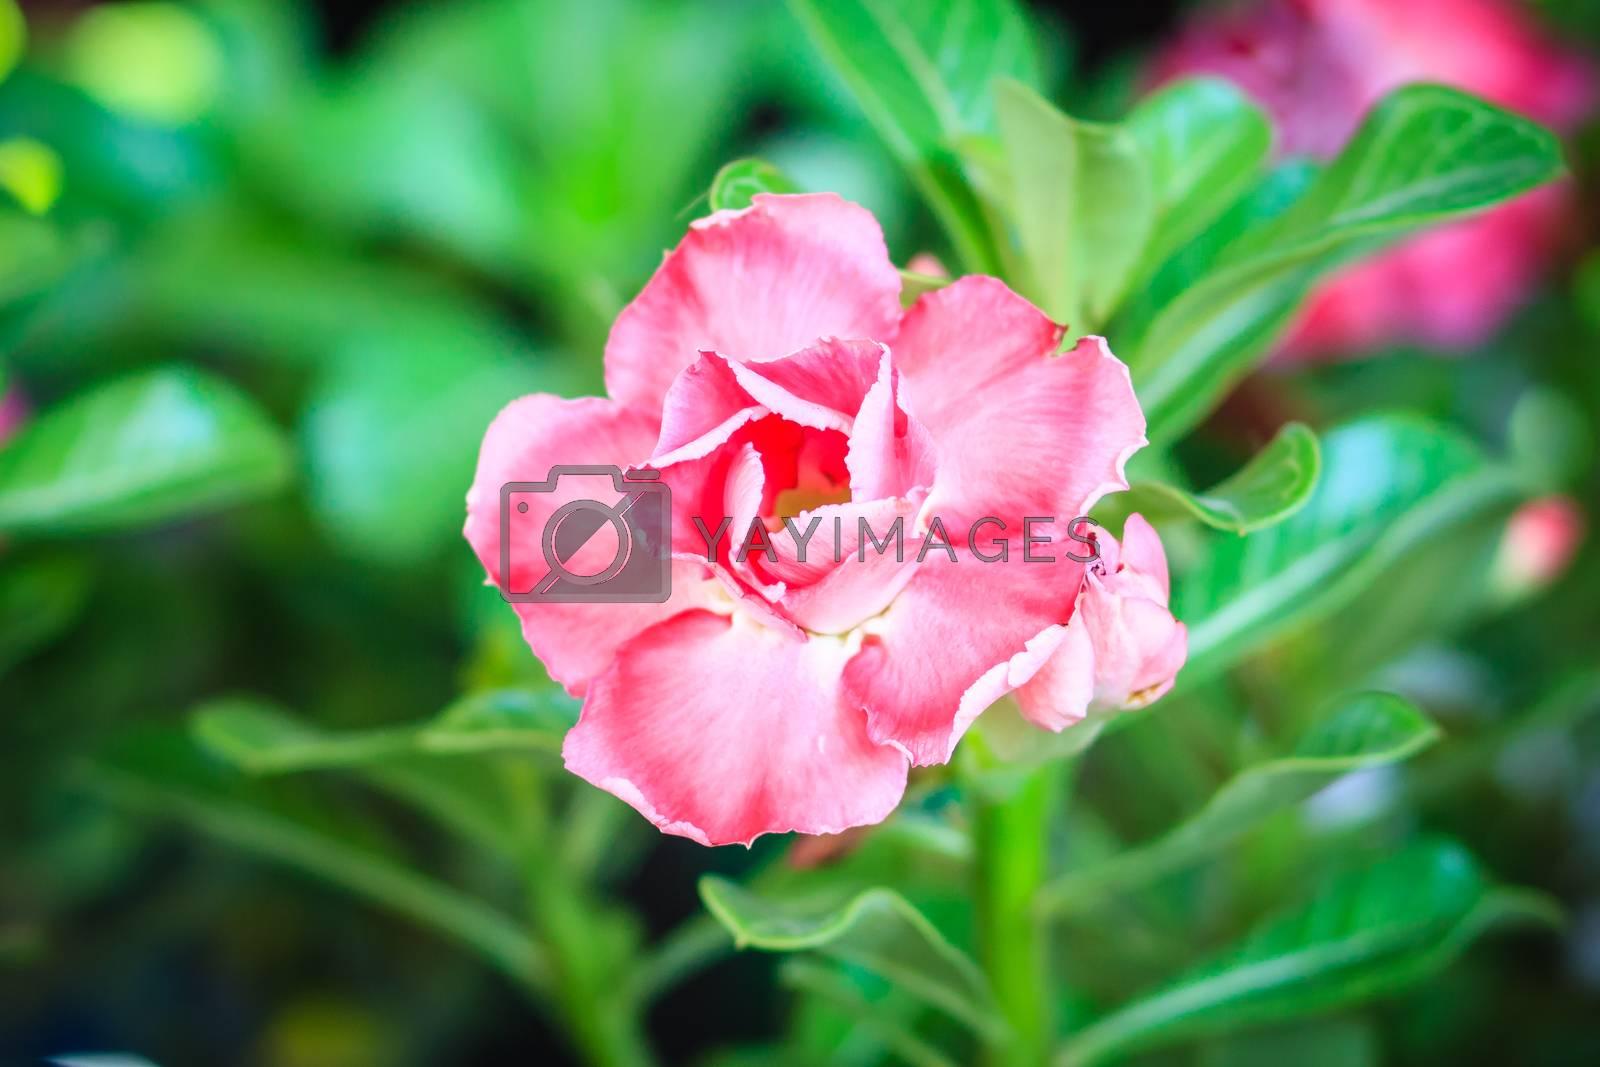 Beautiful hybrid Adenium Obesum (Desert rose) red layered flower for sale at the tree market.